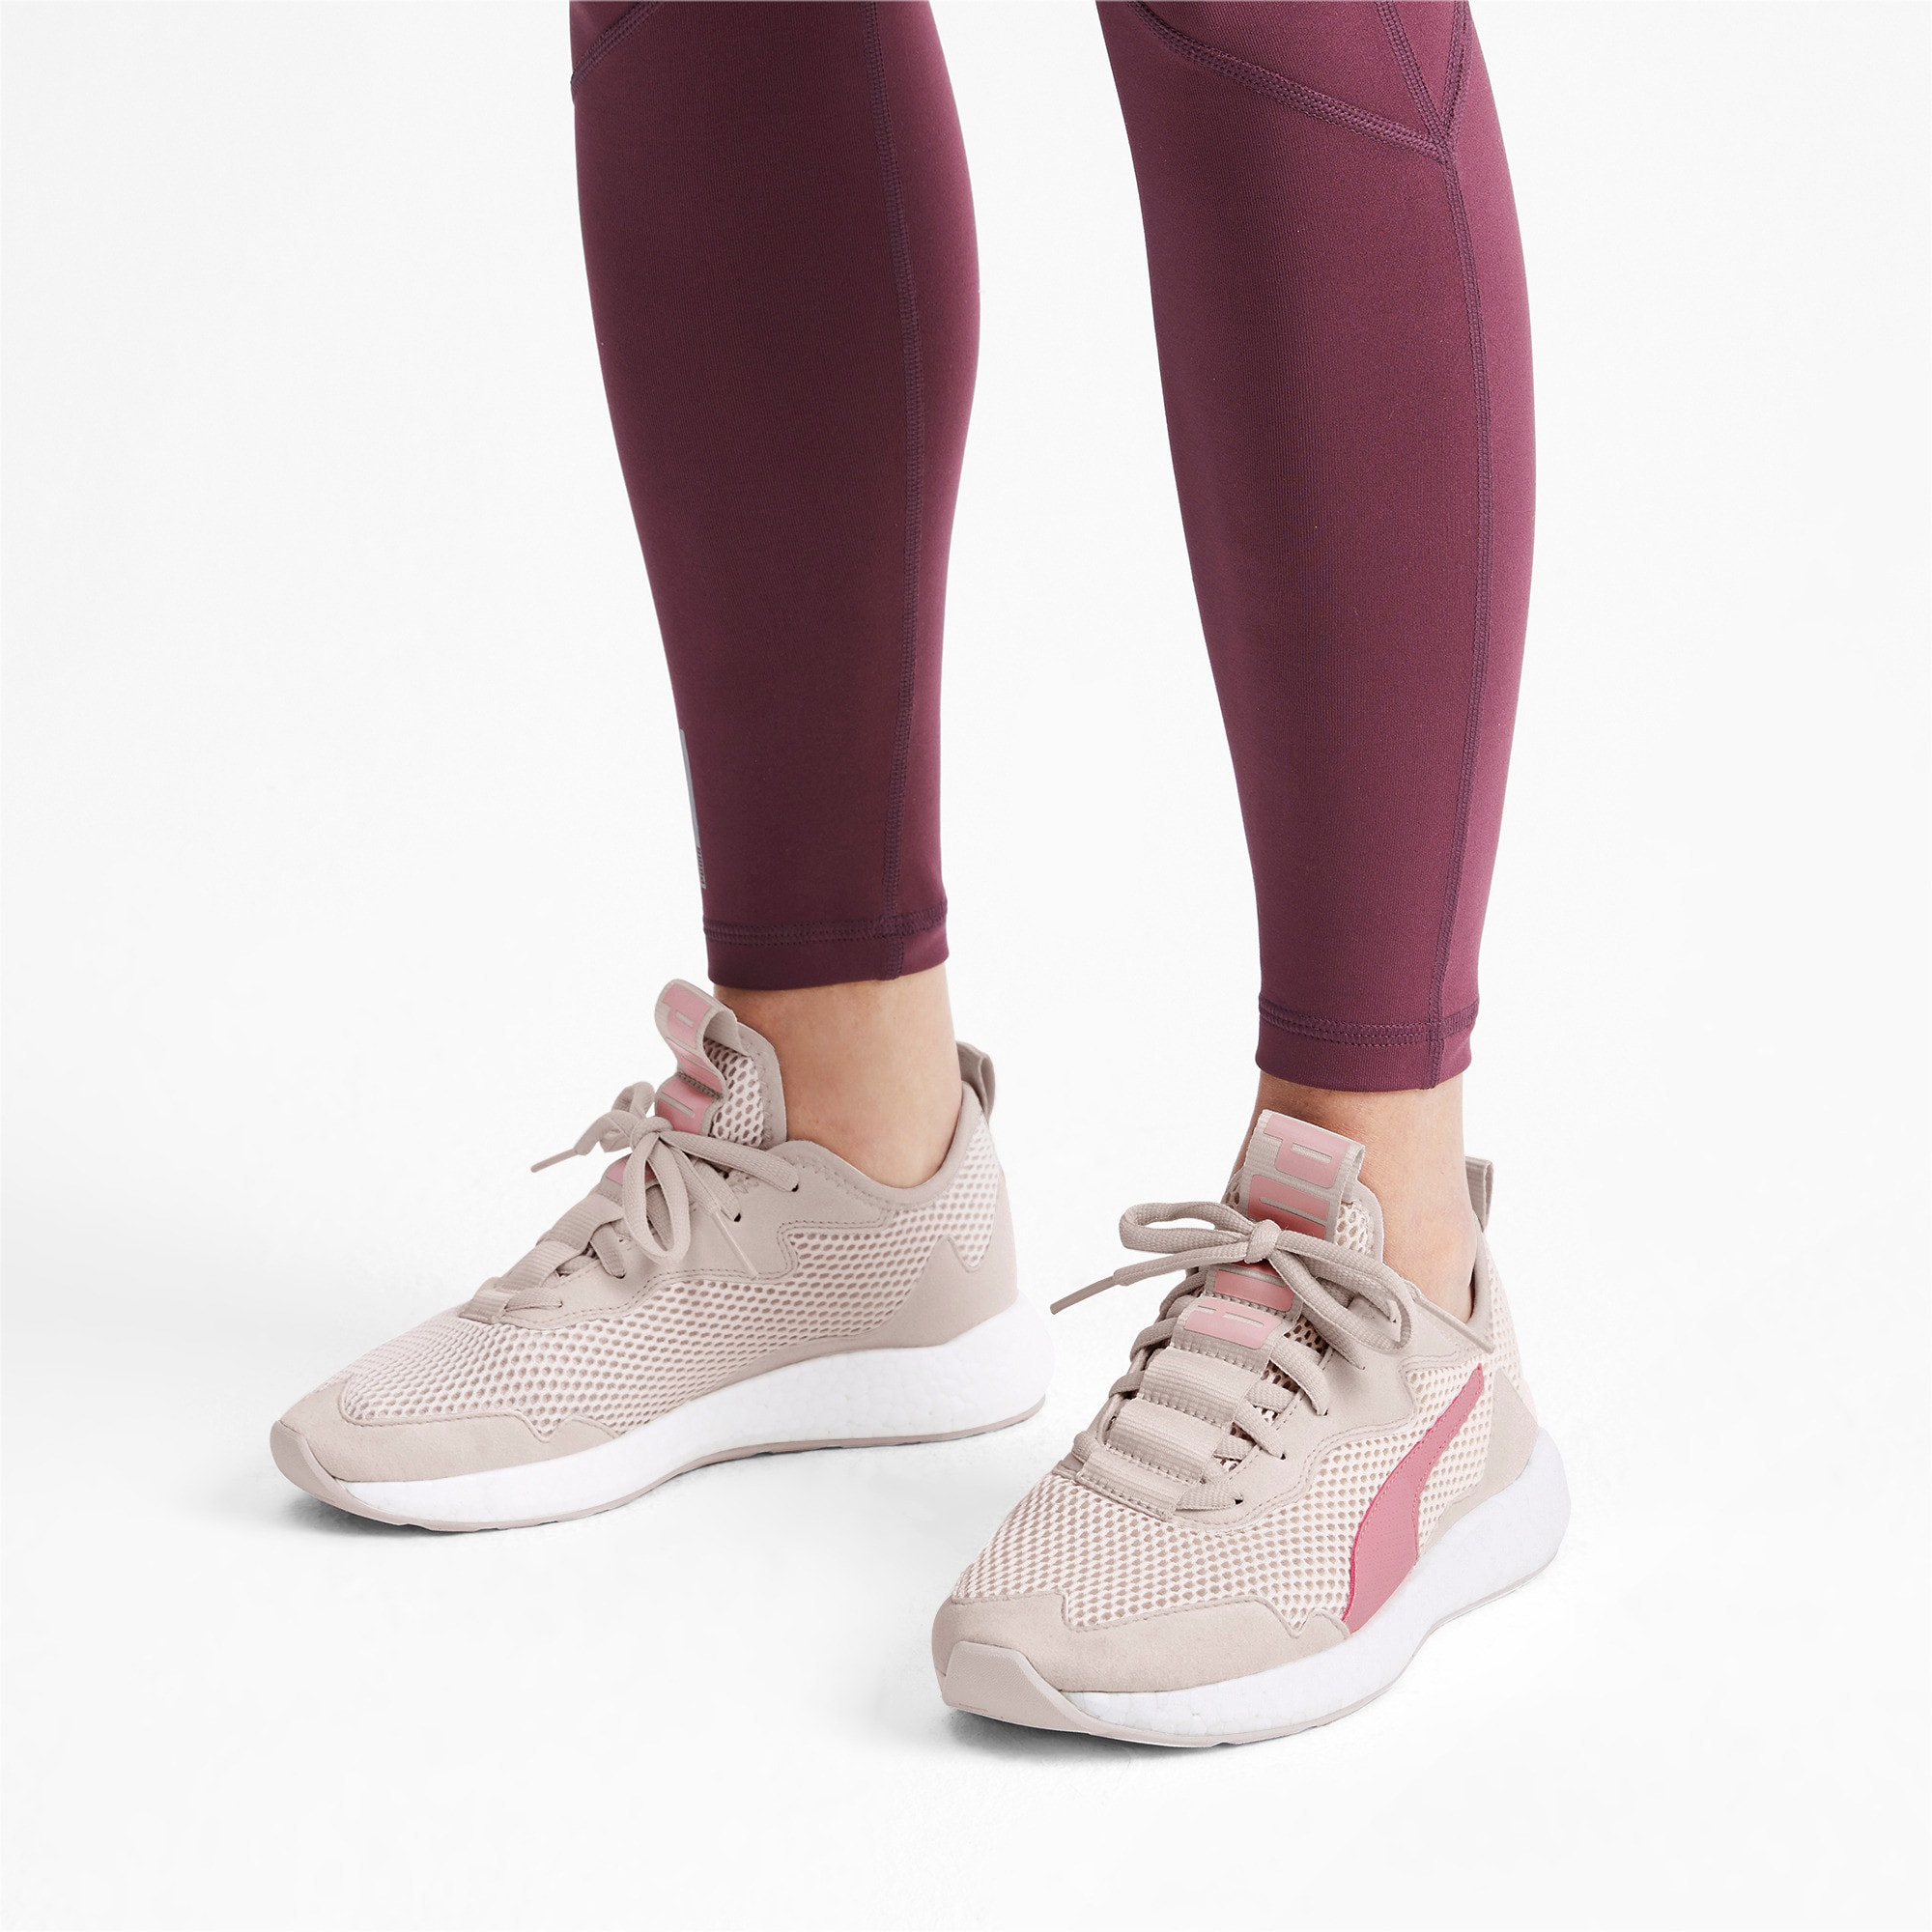 Thumbnail 2 of NRGY Neko Skim Women's Running Shoes, Pastel Parchment-Bridal Rose, medium-IND